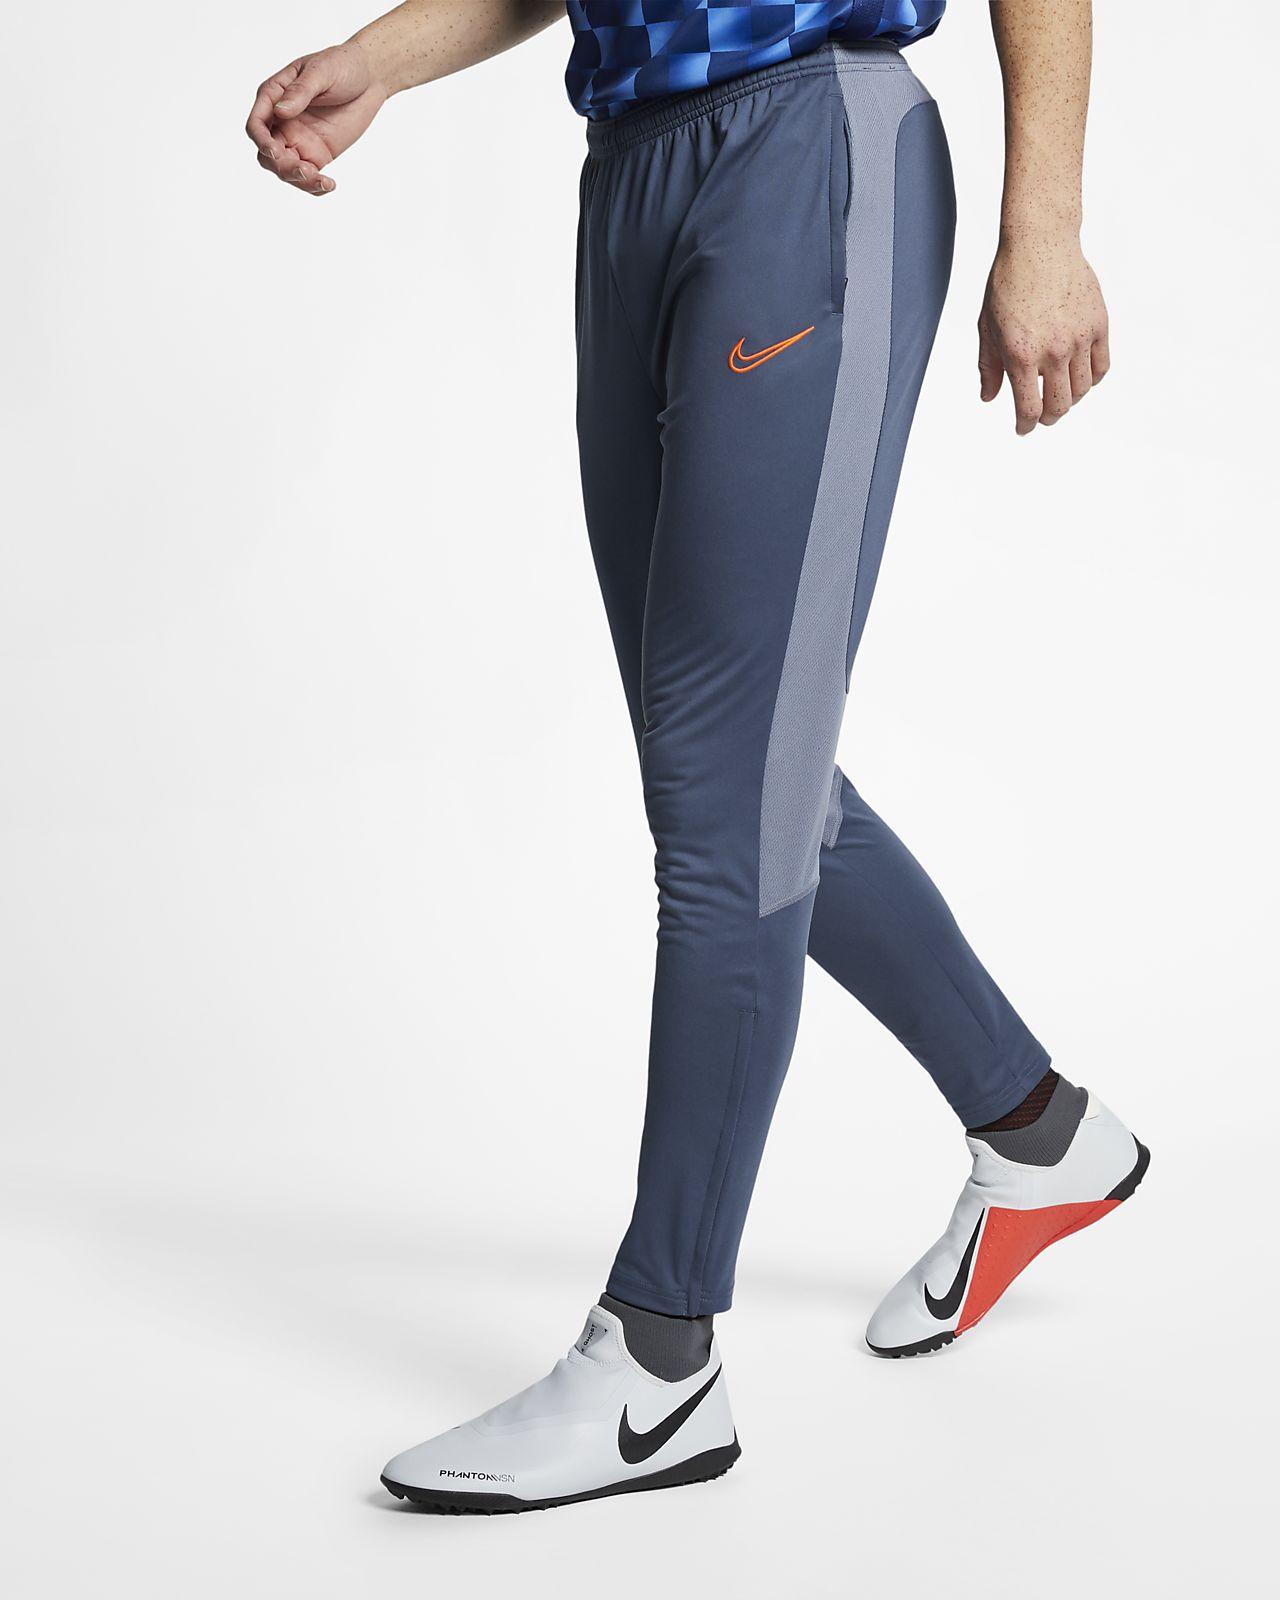 202c099f6aa8 Nike Dri-FIT Academy Men's Soccer Pants. Nike.com